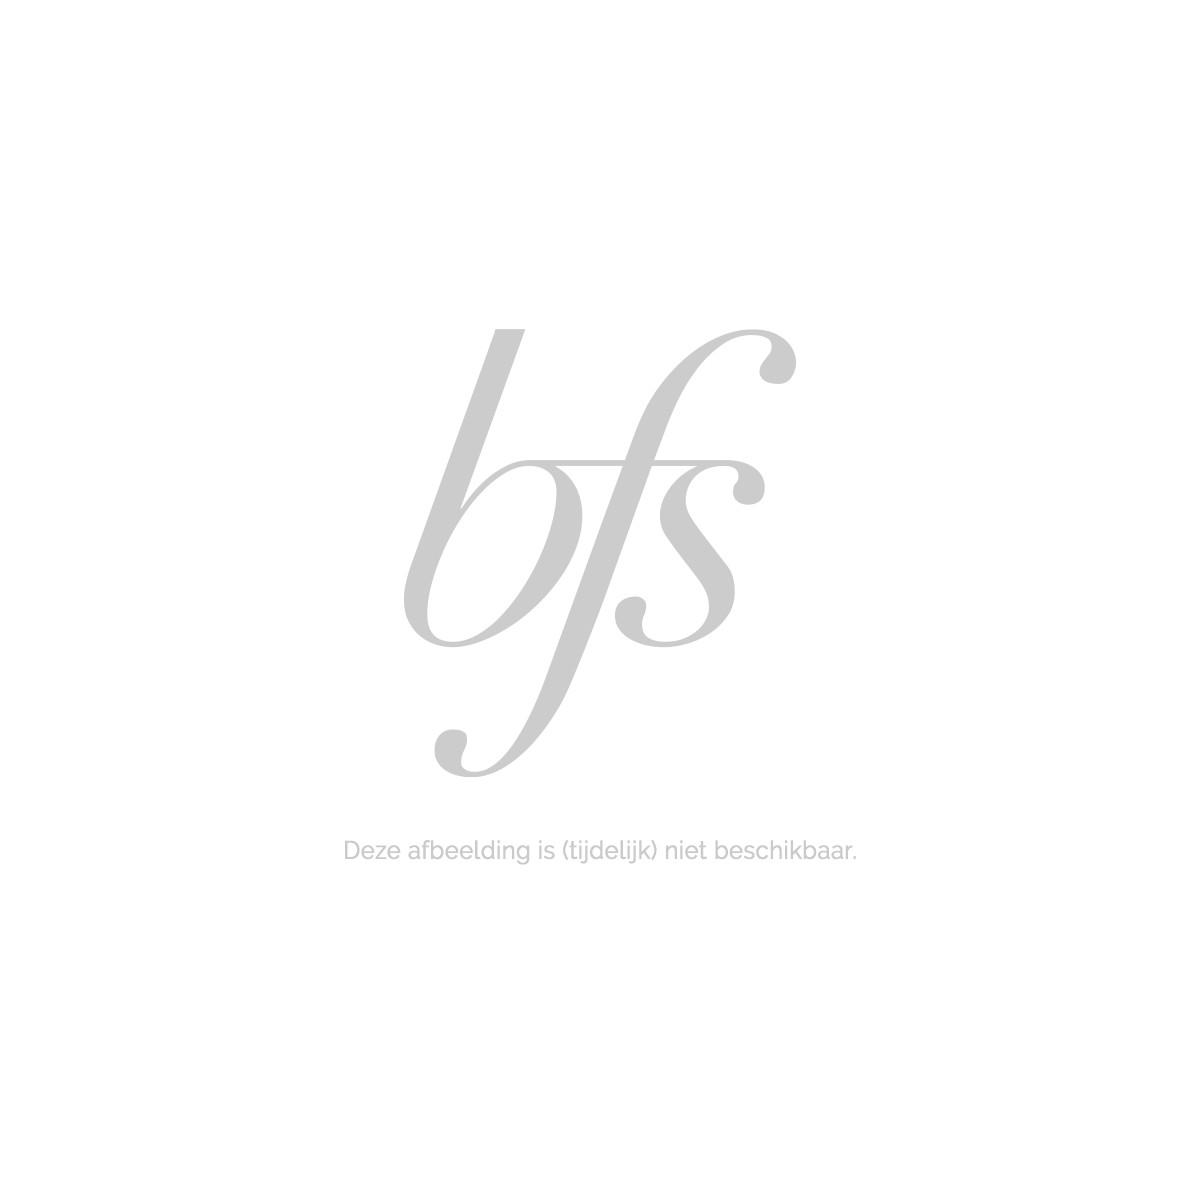 Estee Lauder Resil. Multi-Effect Face Neck Creme Spf15 Dry Skin 50 Ml